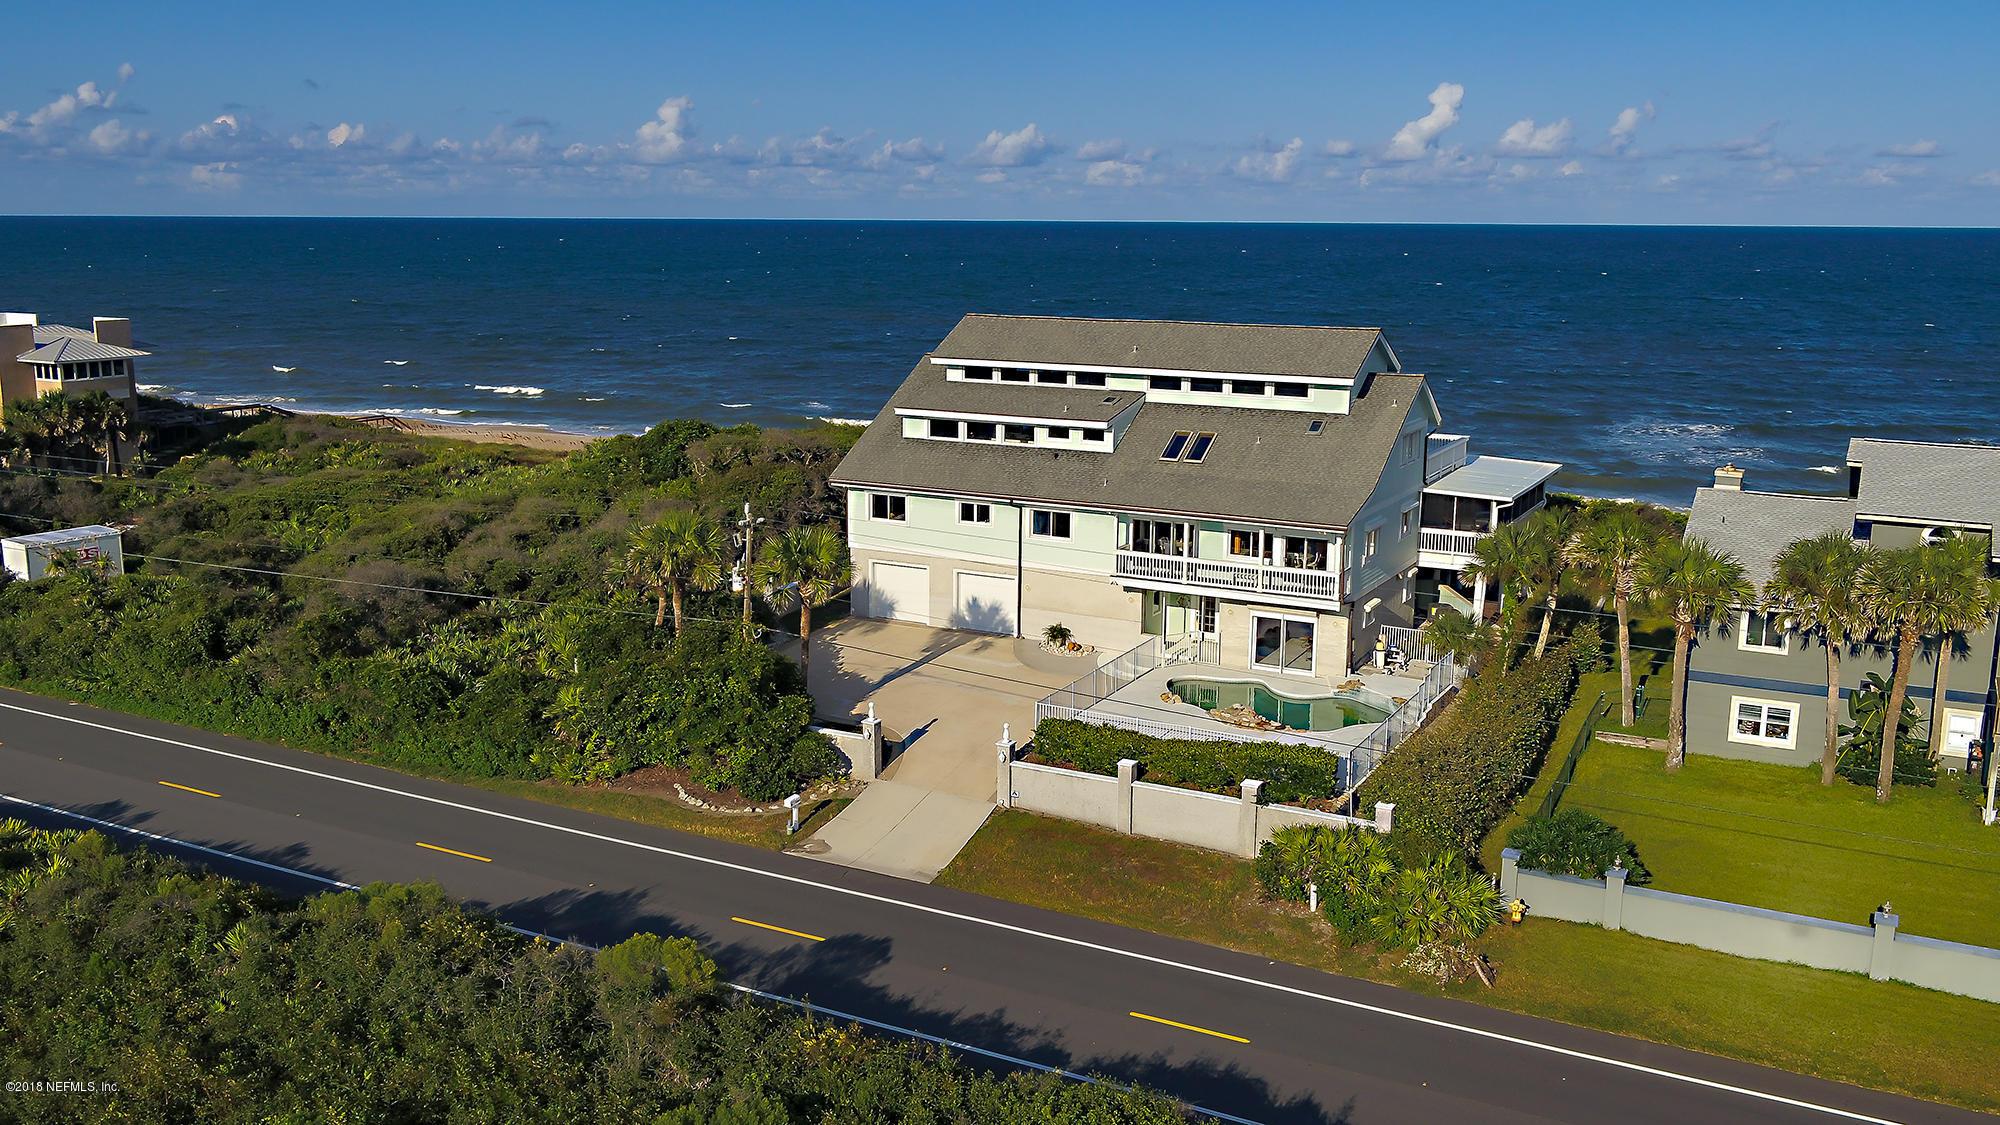 2401&2403 PONTE VEDRA, PONTE VEDRA BEACH, FLORIDA 32082, 6 Bedrooms Bedrooms, ,5 BathroomsBathrooms,Residential - single family,For sale,PONTE VEDRA,959914